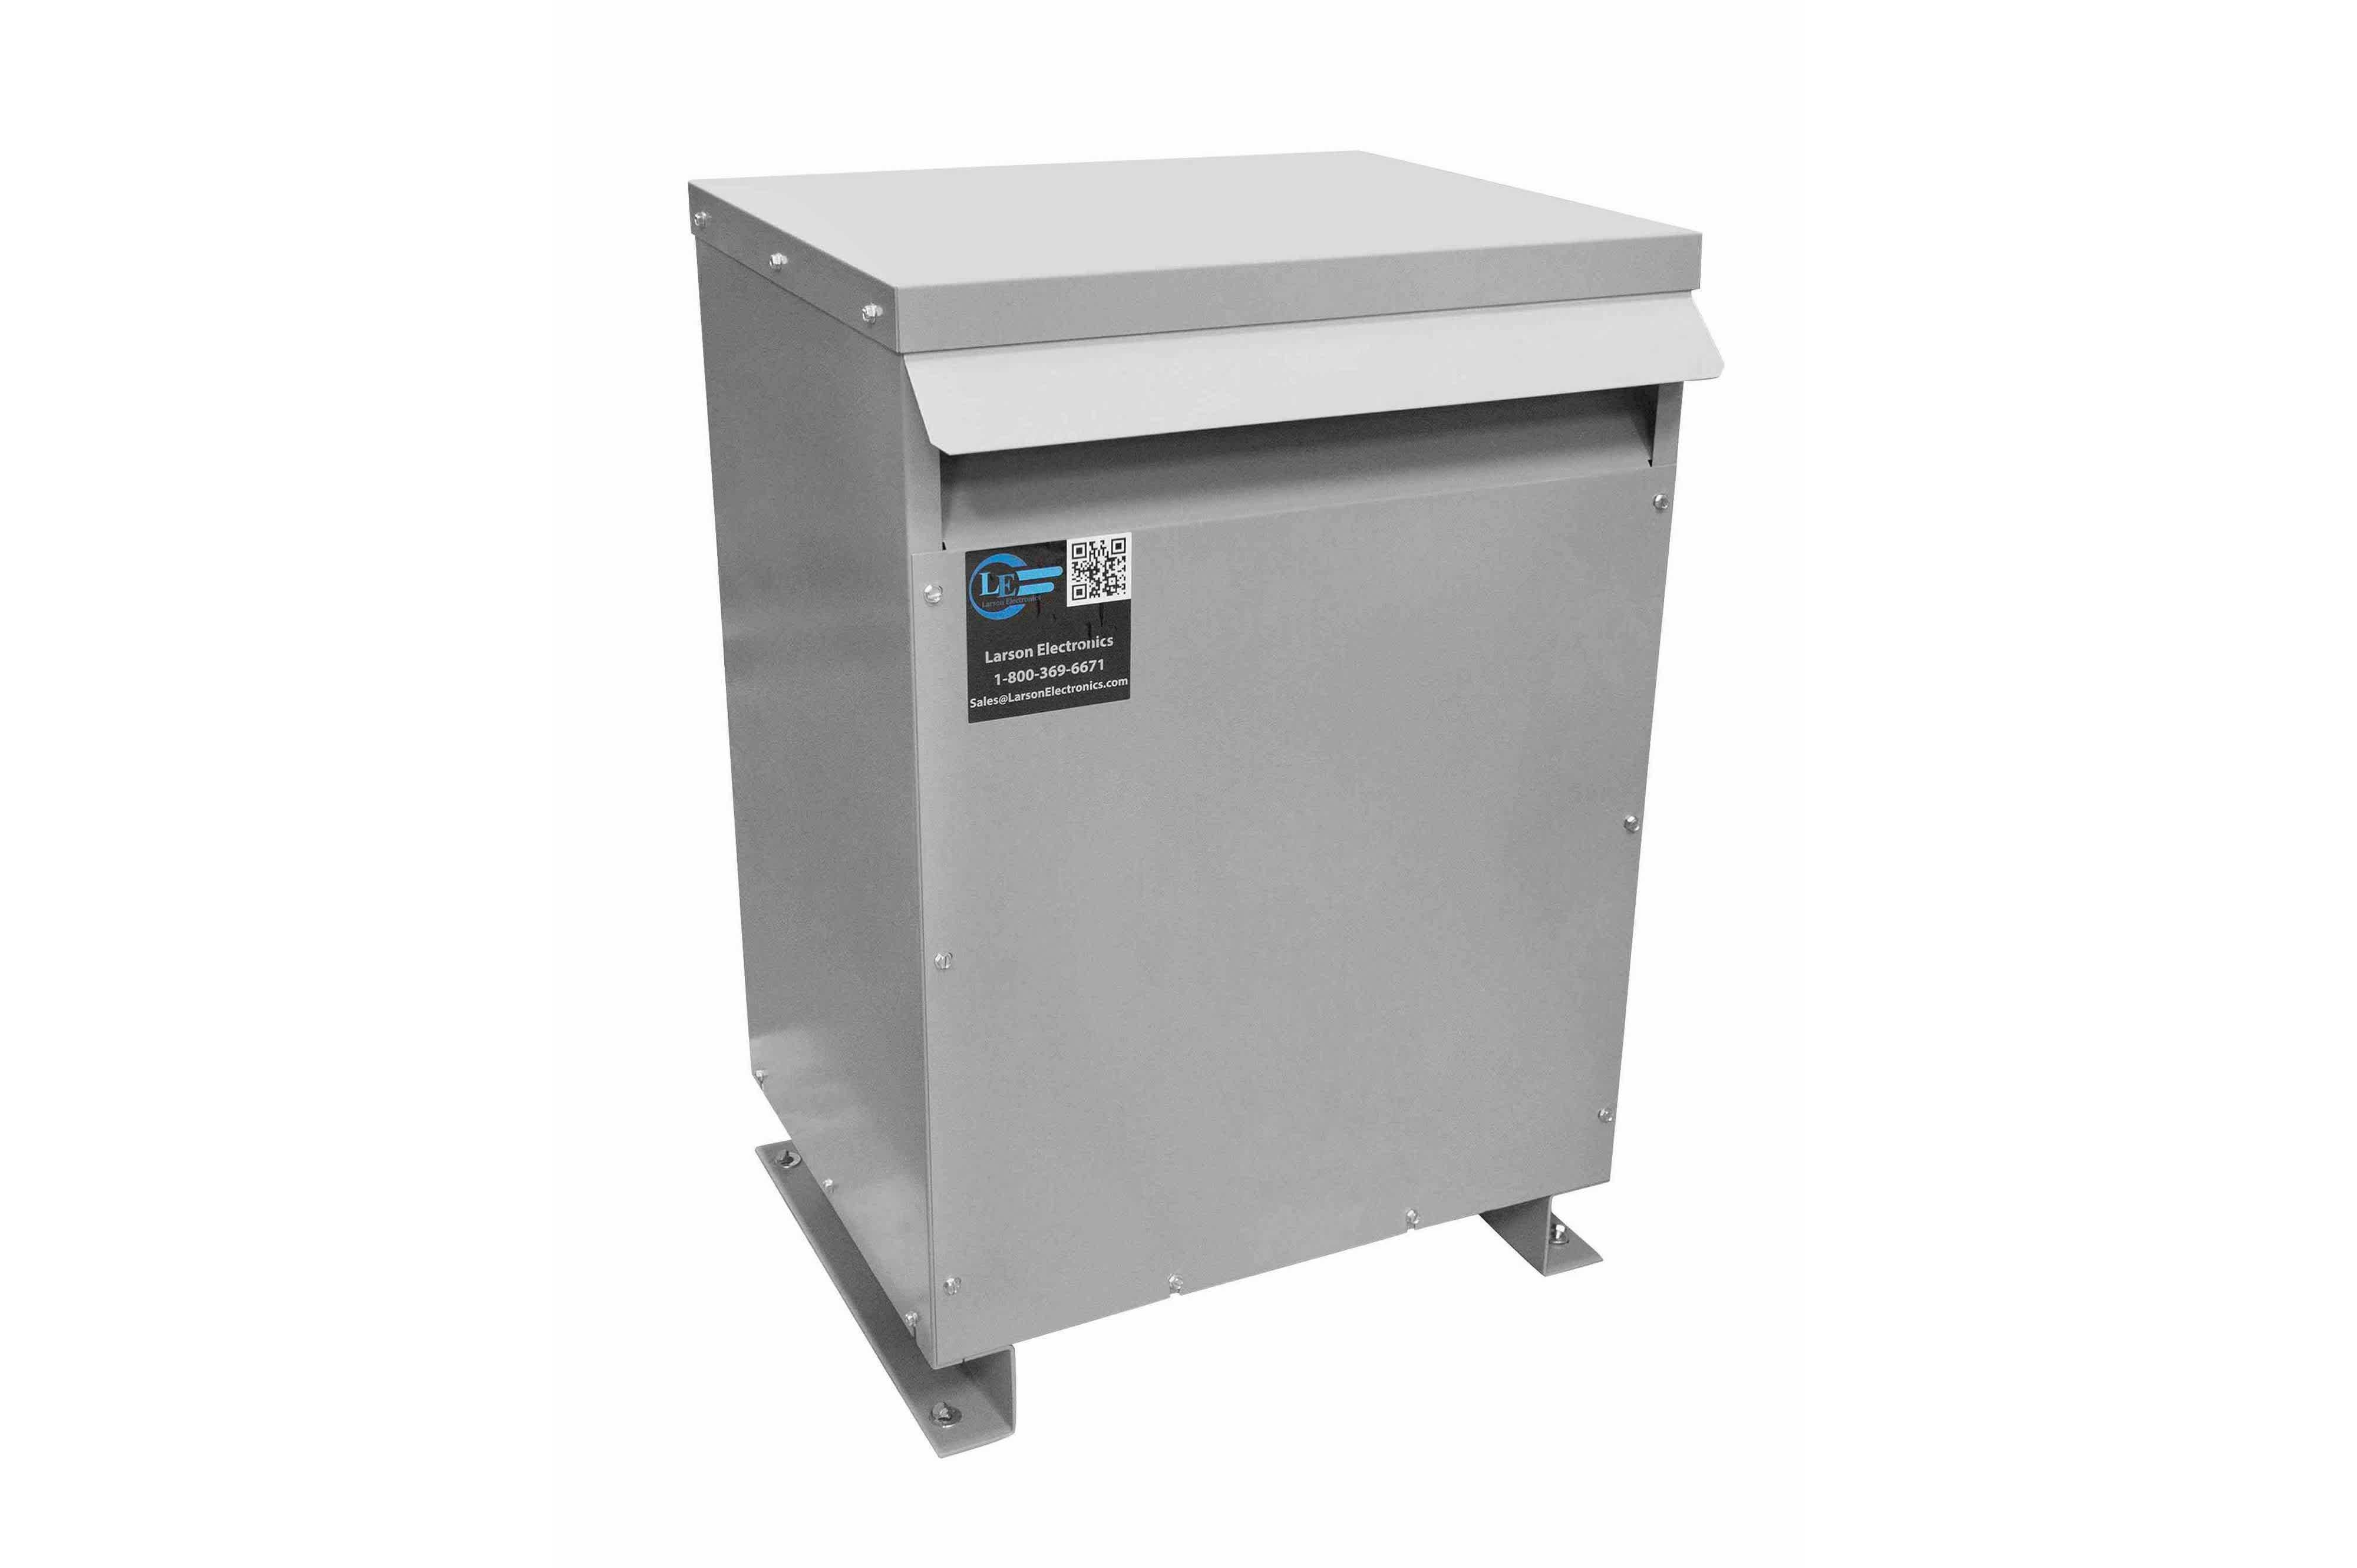 25 kVA 3PH Isolation Transformer, 600V Wye Primary, 208Y/120 Wye-N Secondary, N3R, Ventilated, 60 Hz